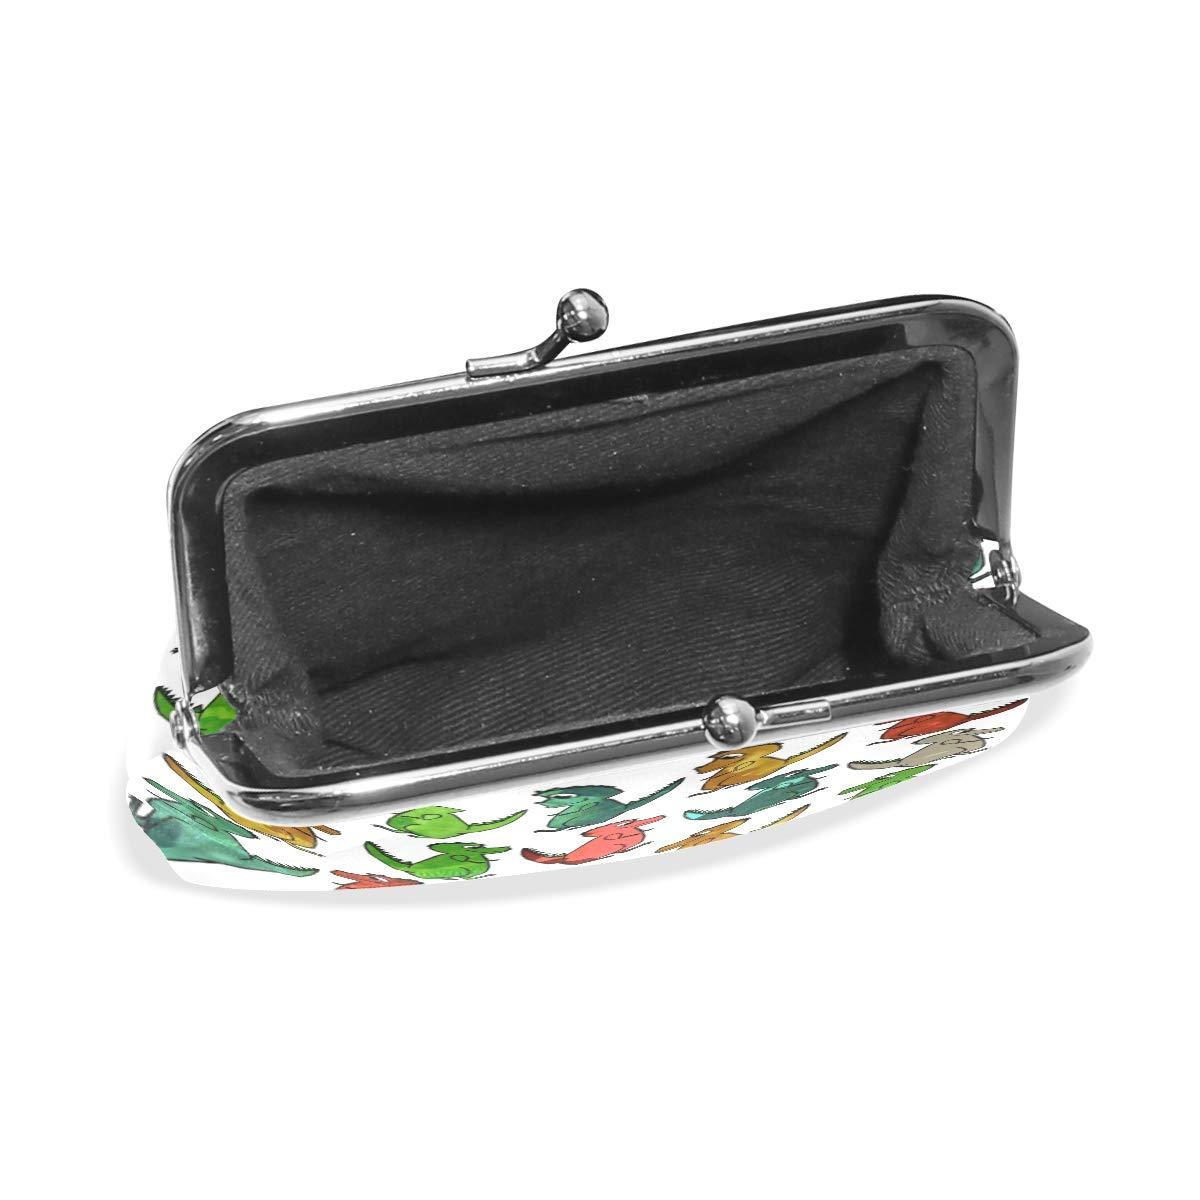 TIKISMILE Dinosaur Seamless Leather Fashion Buckle Cute Coin Purse Bags Wallet